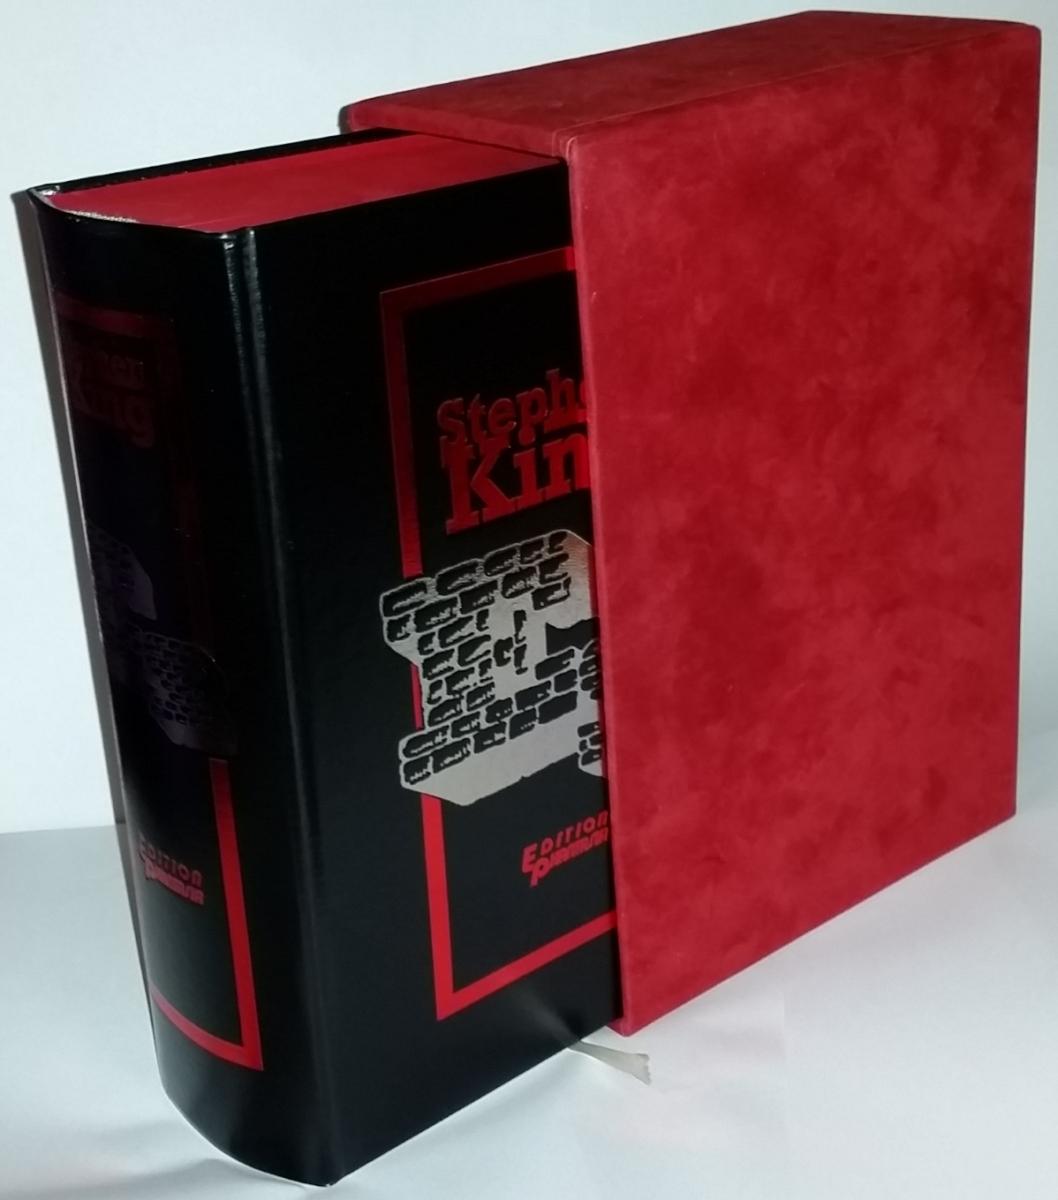 ES (Edition Phantasia) ksiązka w etui - obrazek